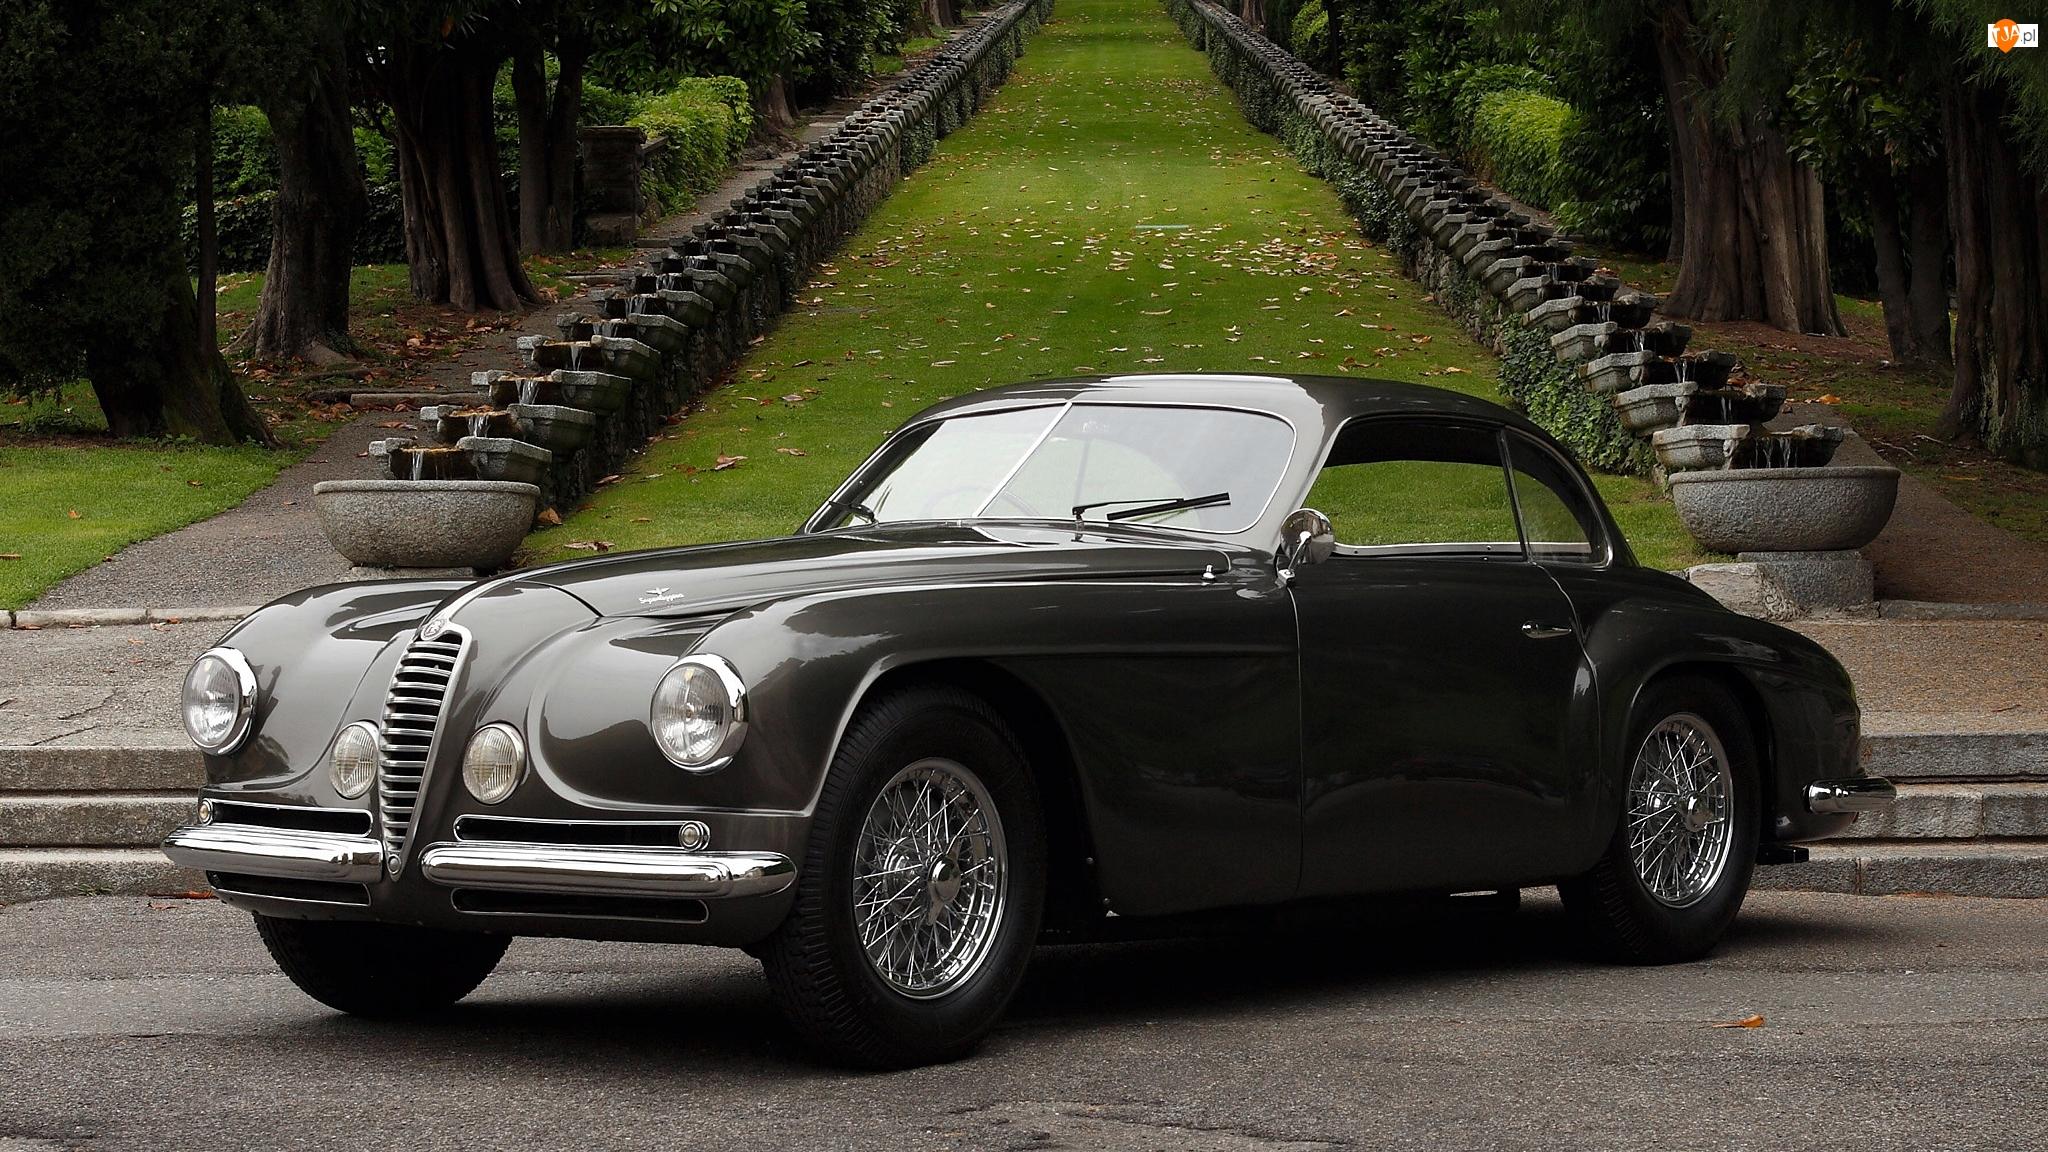 1949-1952, Zabytkowy, Alfa Romeo 6C 2500 SS Villa dEste